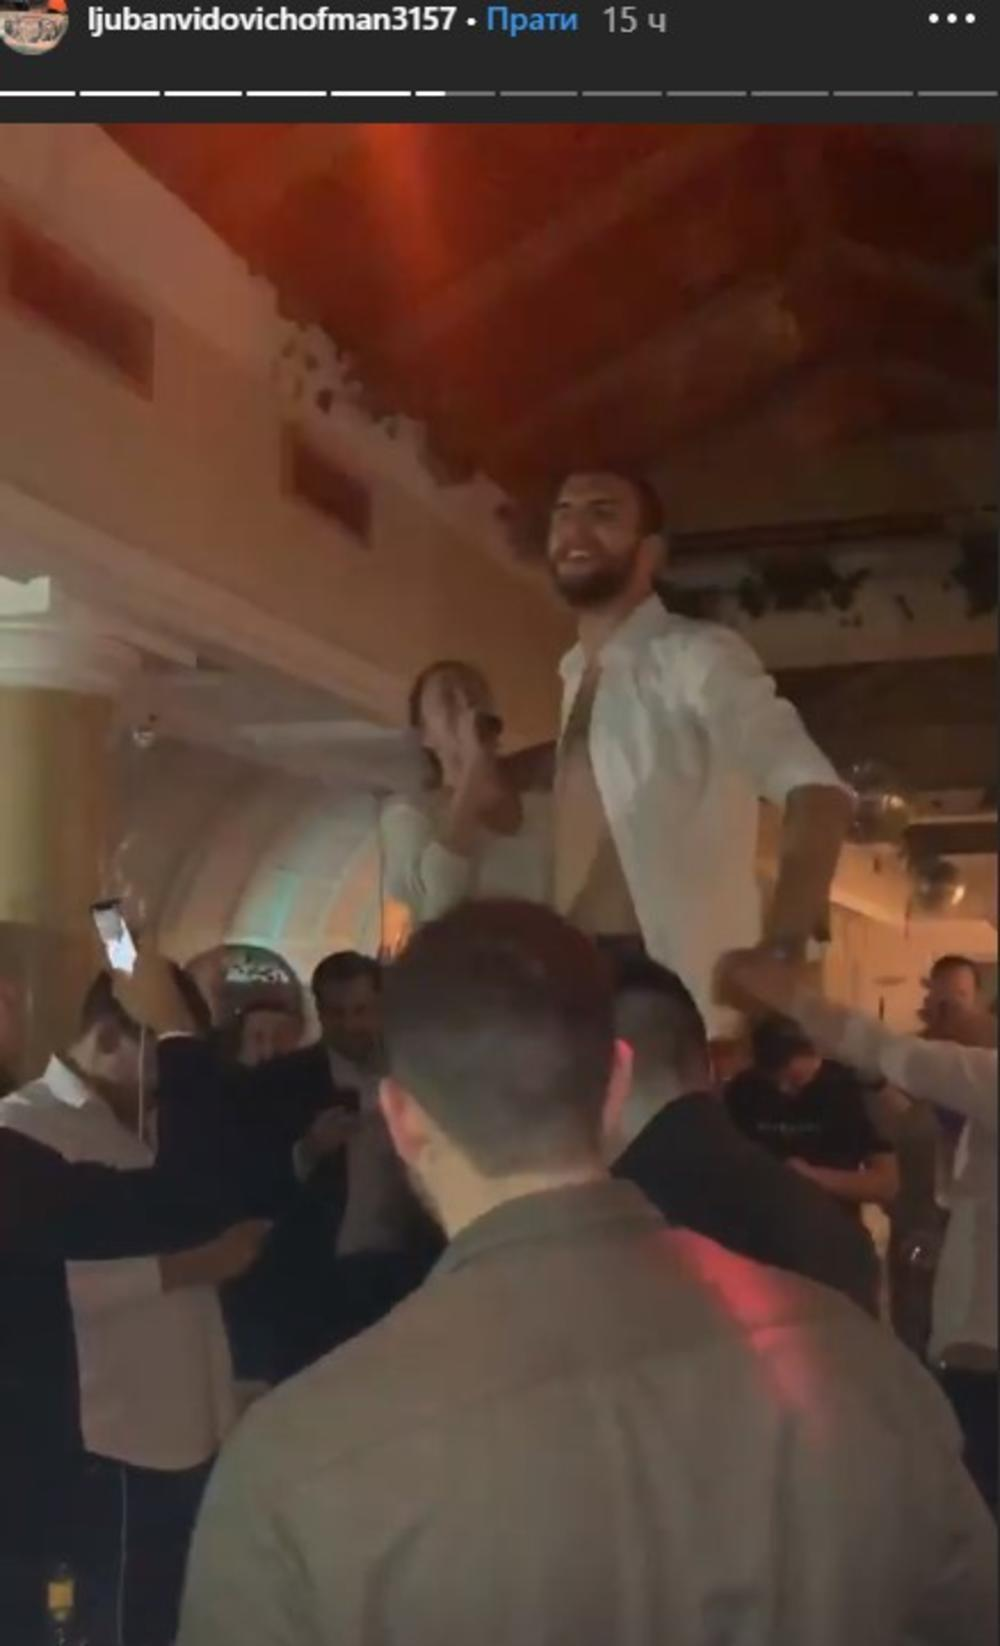 <p>Sin <strong>Svetlane Ražnatović</strong> će tokom vikenda koji je pred nama stati na ludi kamen, pa je bio red da uživa u poslednjem velikom provodu pred venčanje.</p>